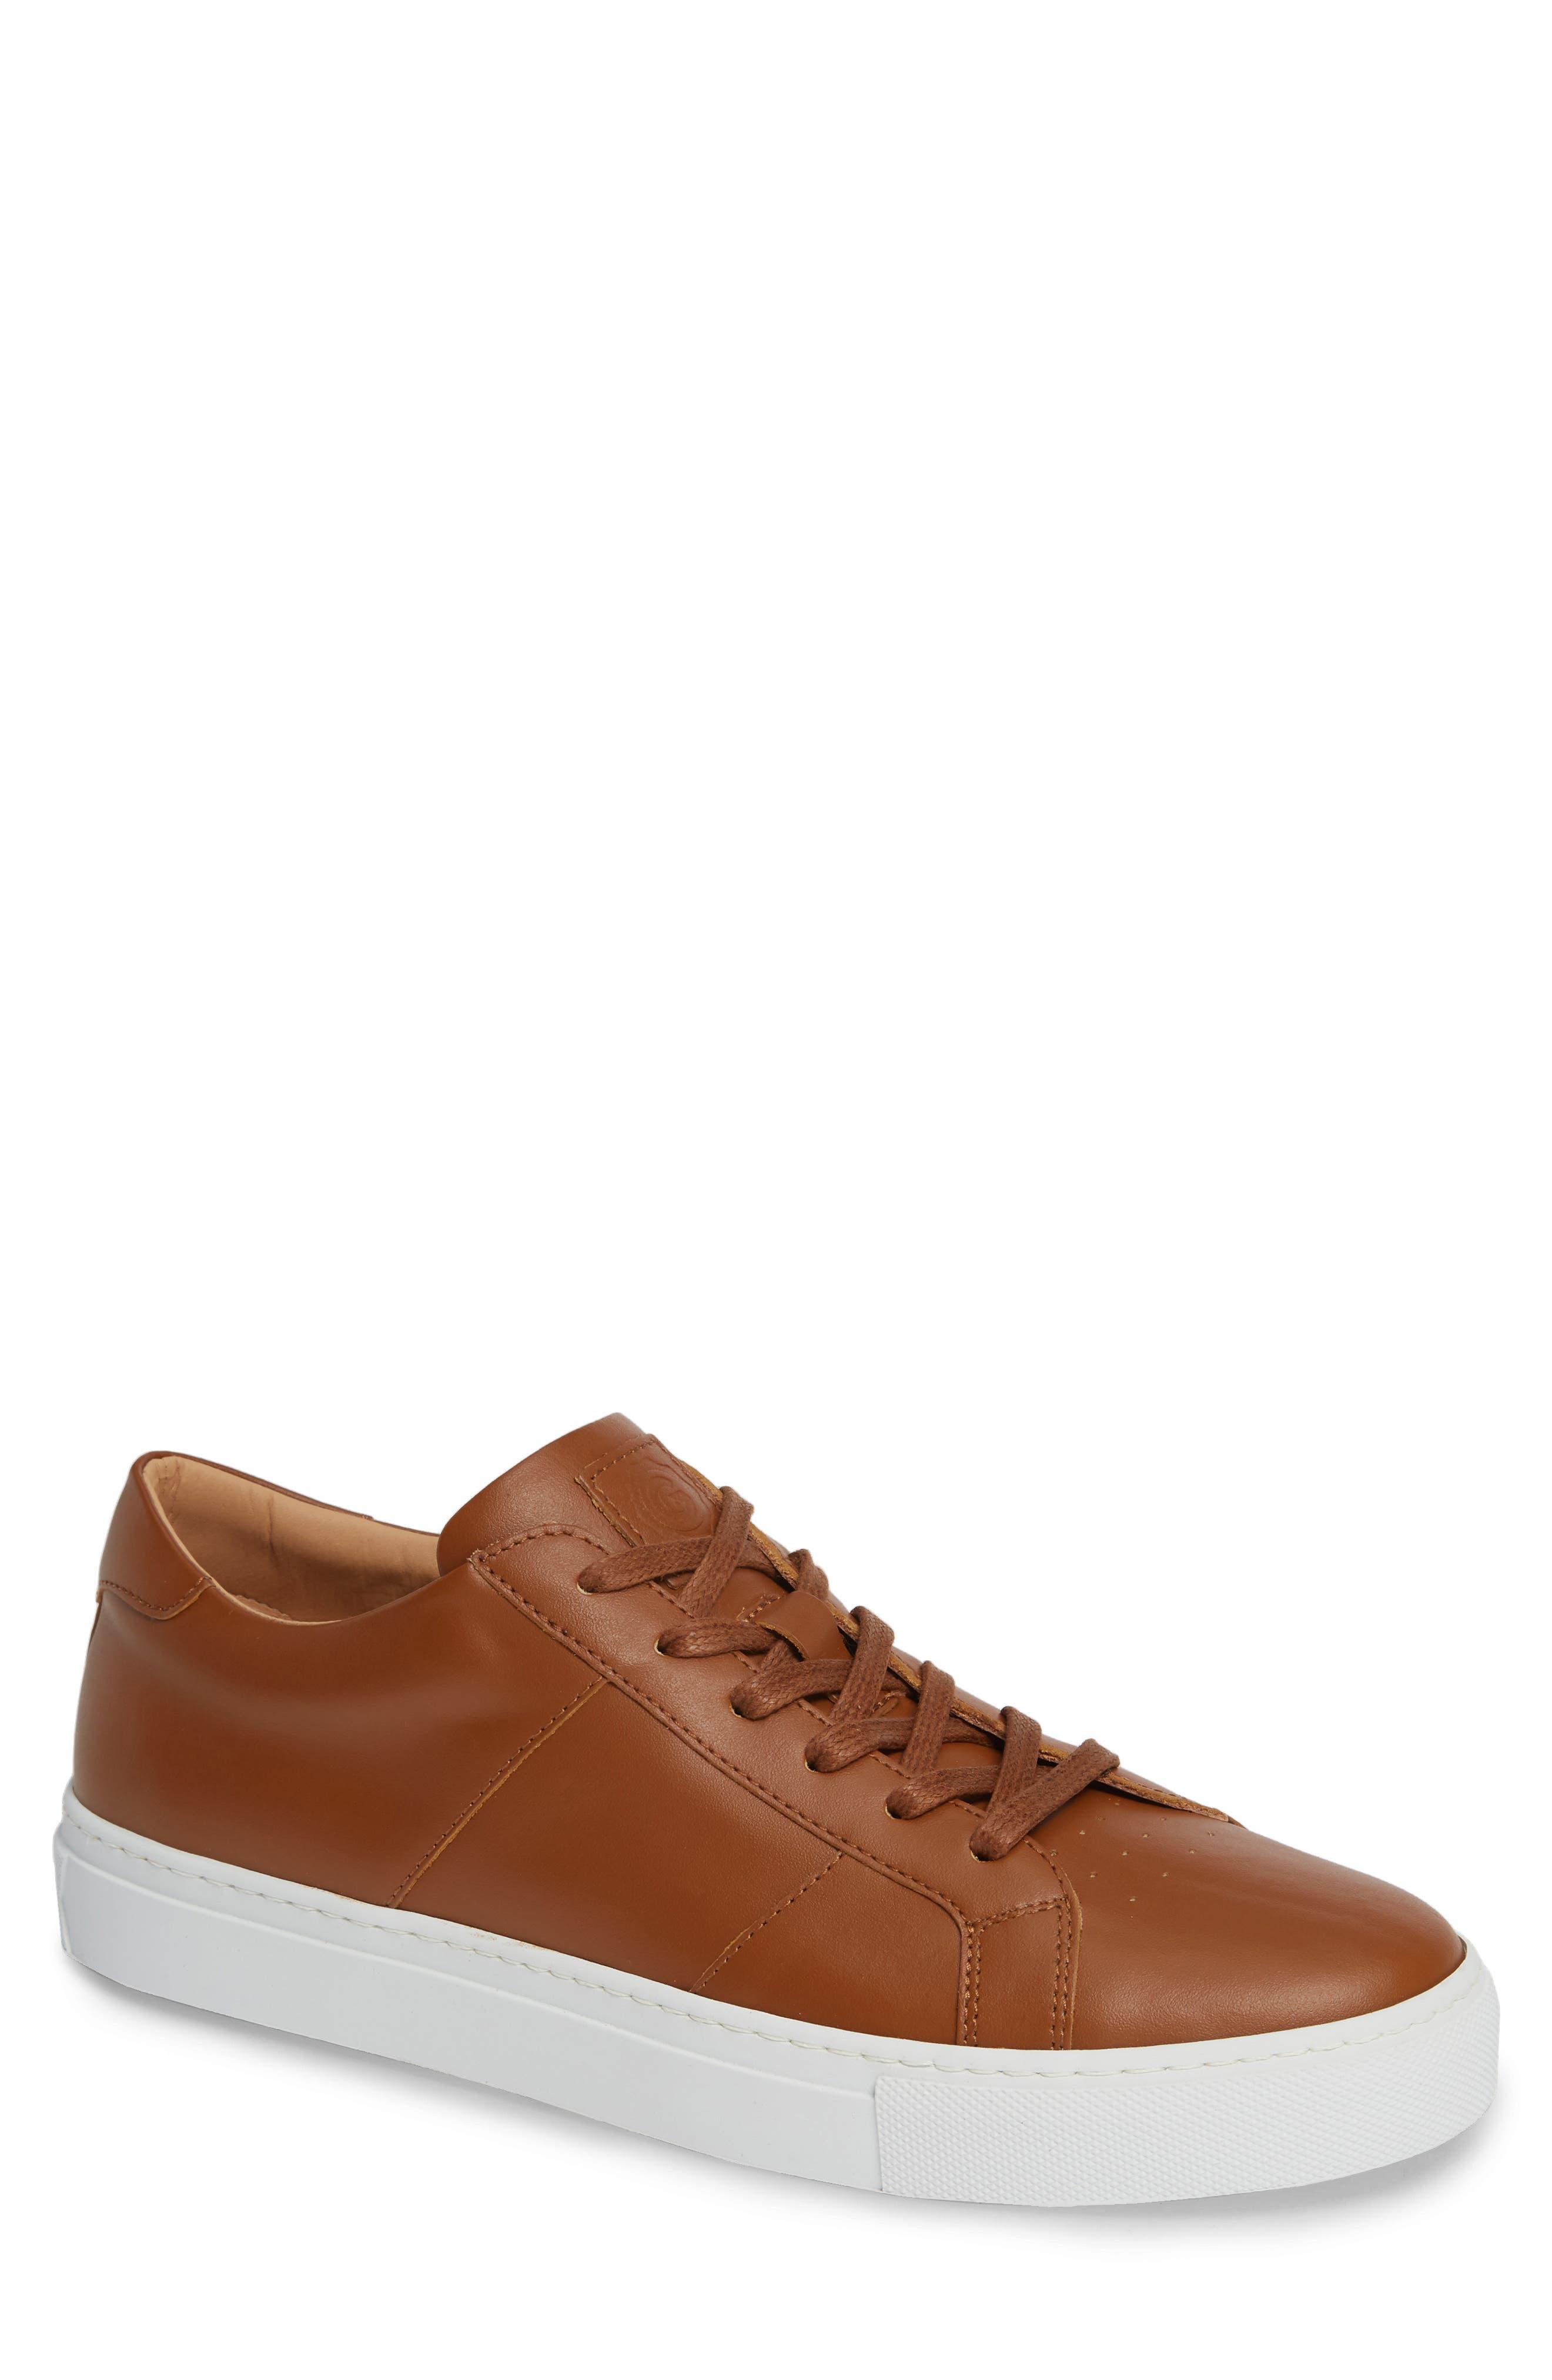 Royale Sneaker,                             Main thumbnail 1, color,                             TAN LEATHER